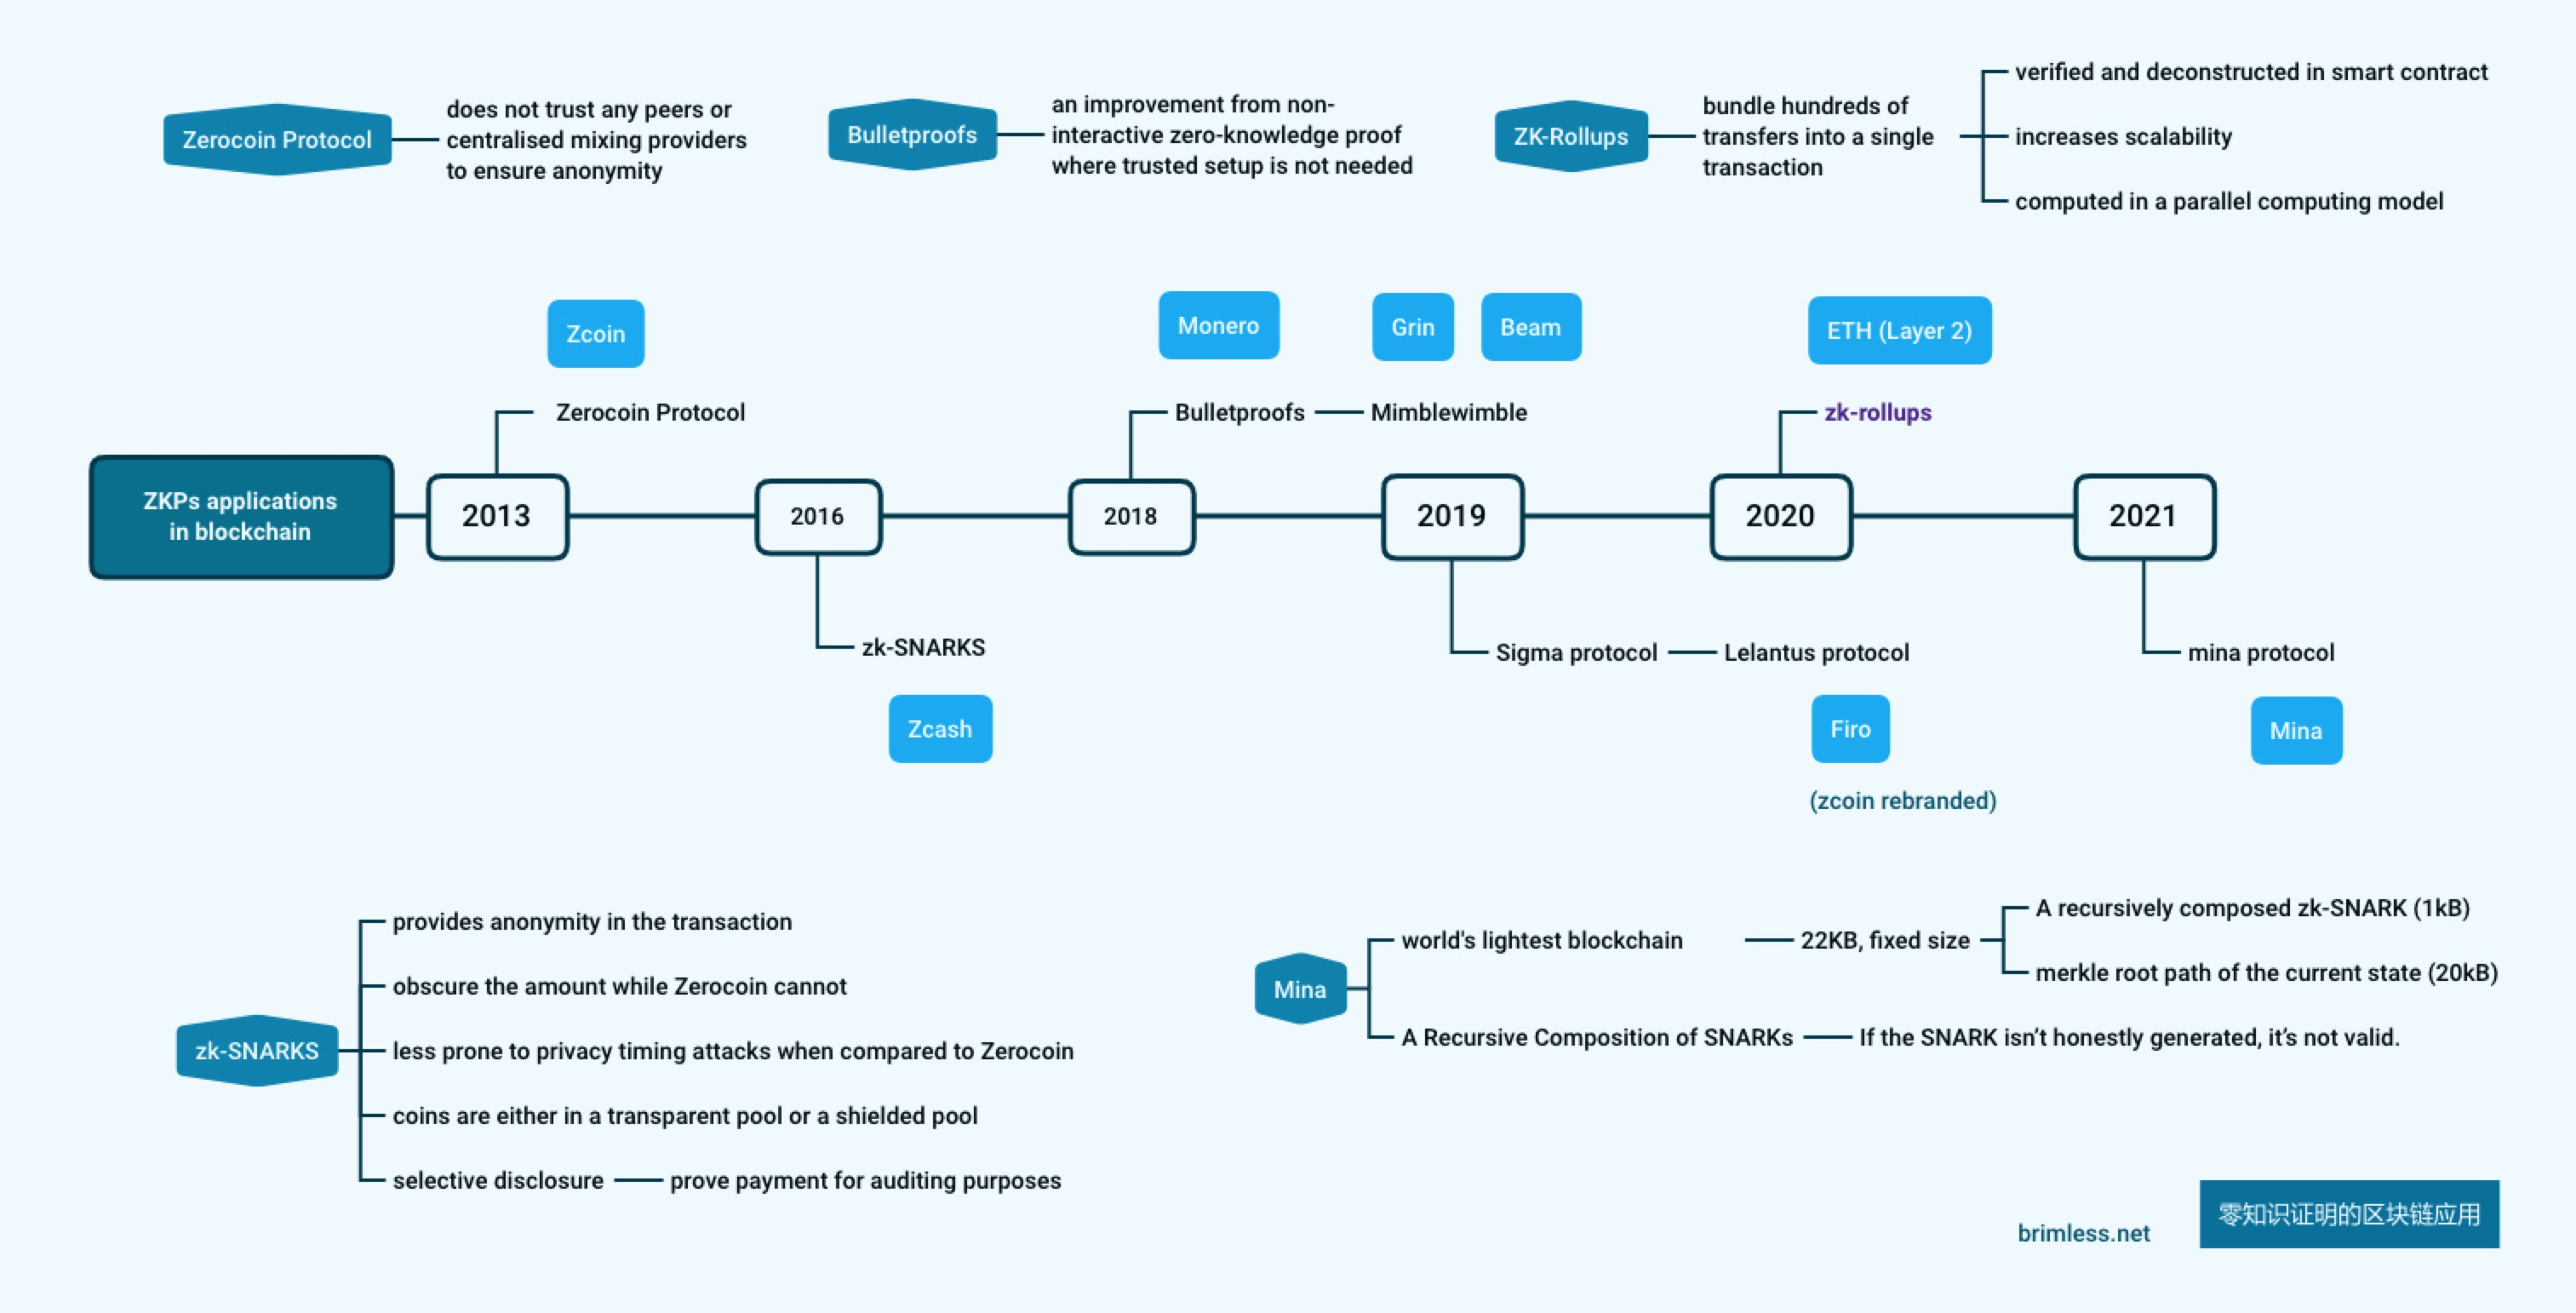 ZKPs applications in blockchain